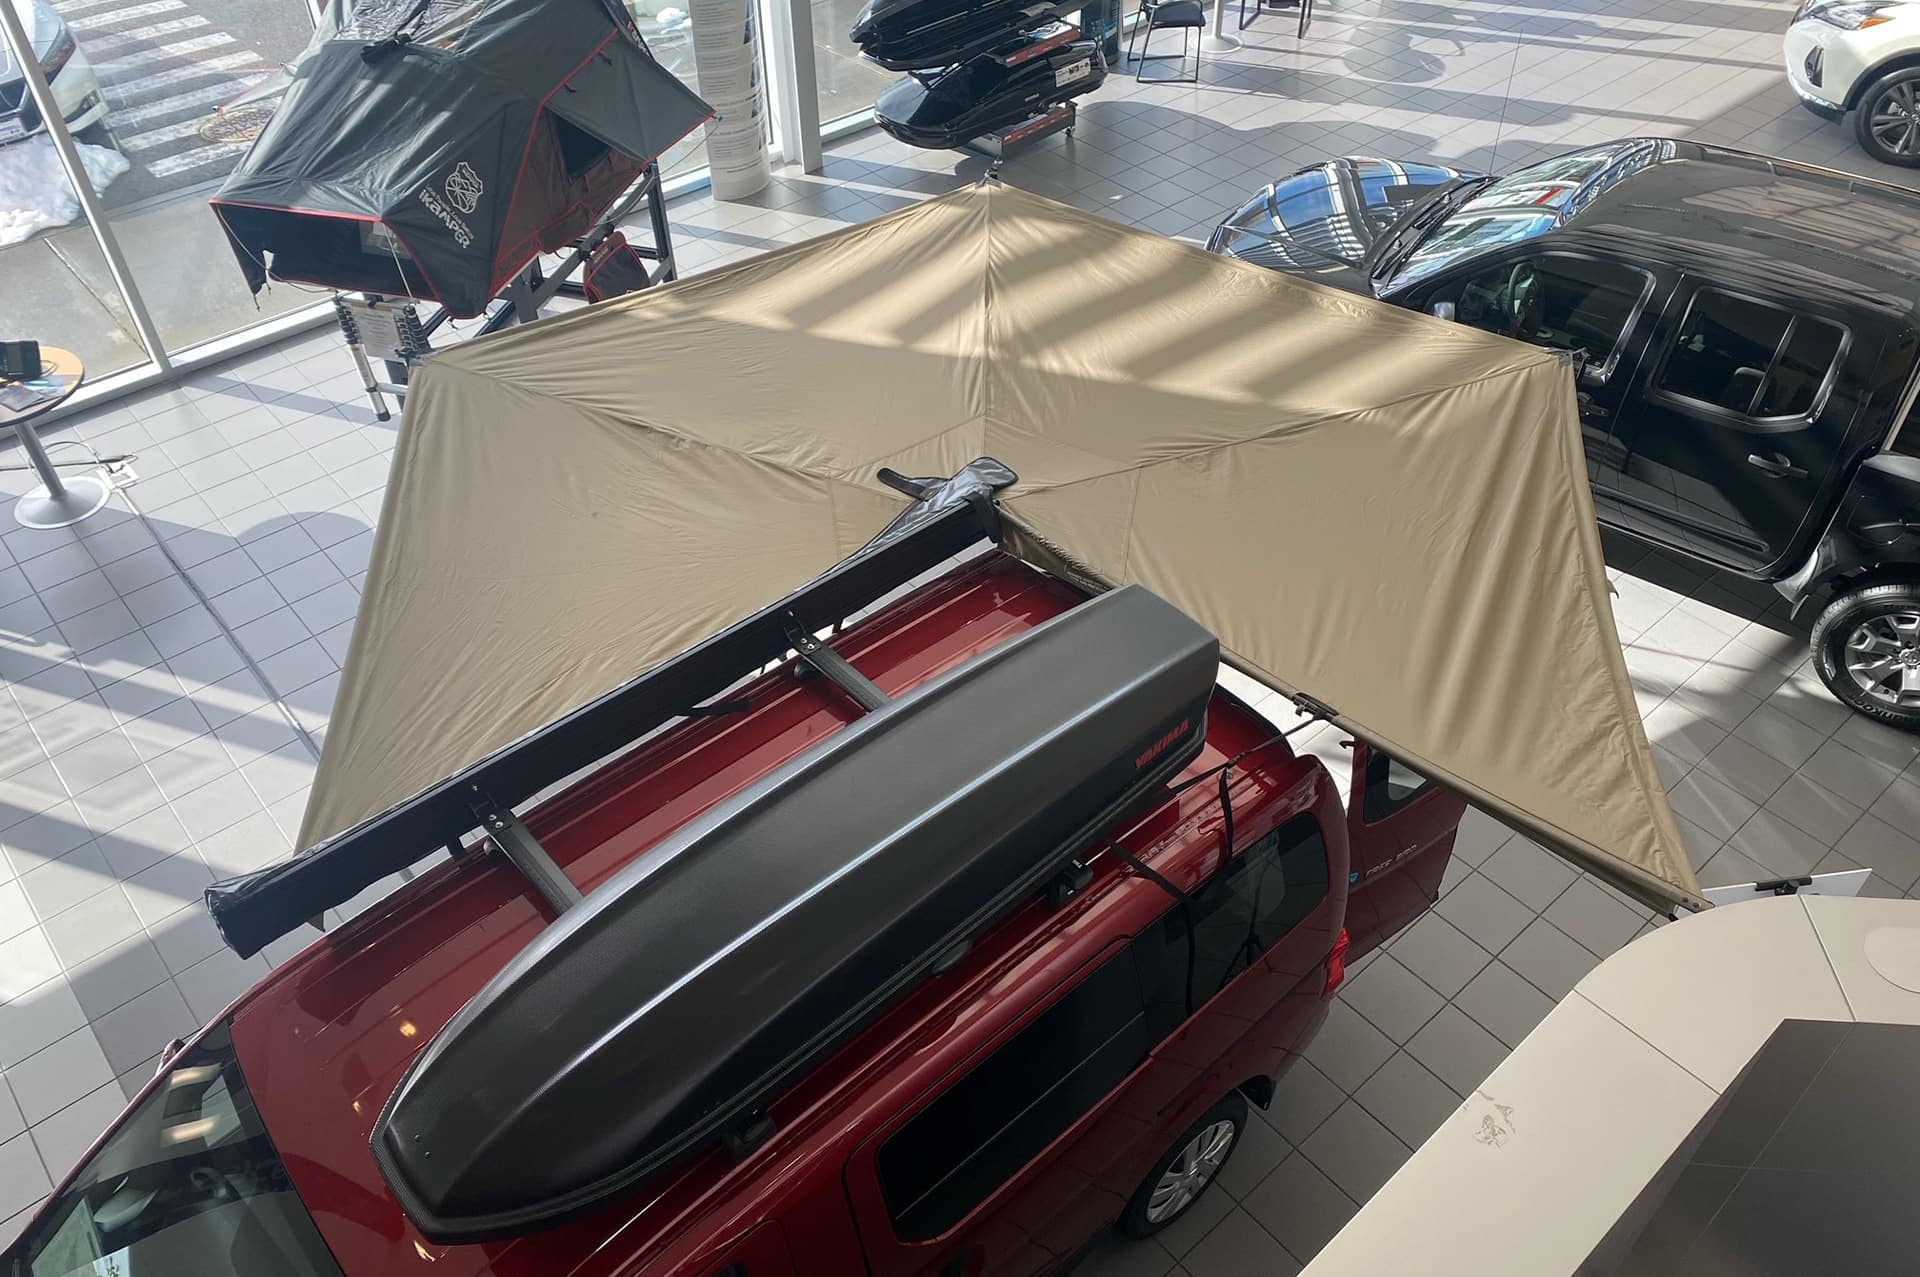 Optional wrap around awning